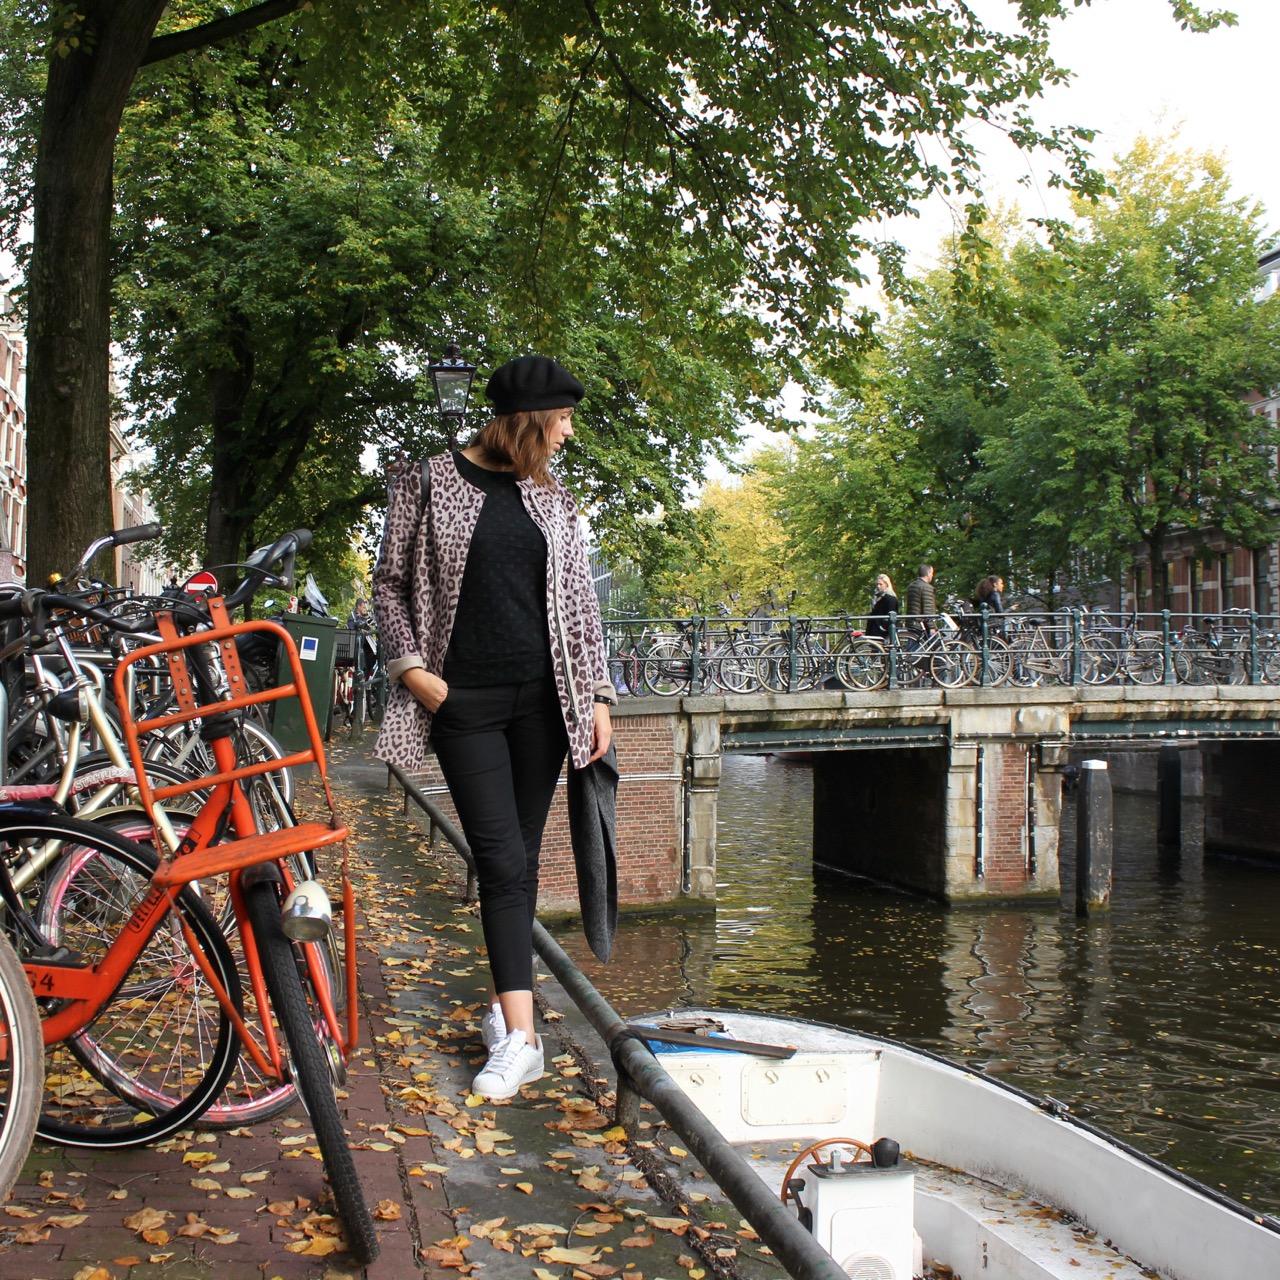 Amsterdam, Netherlands - 4